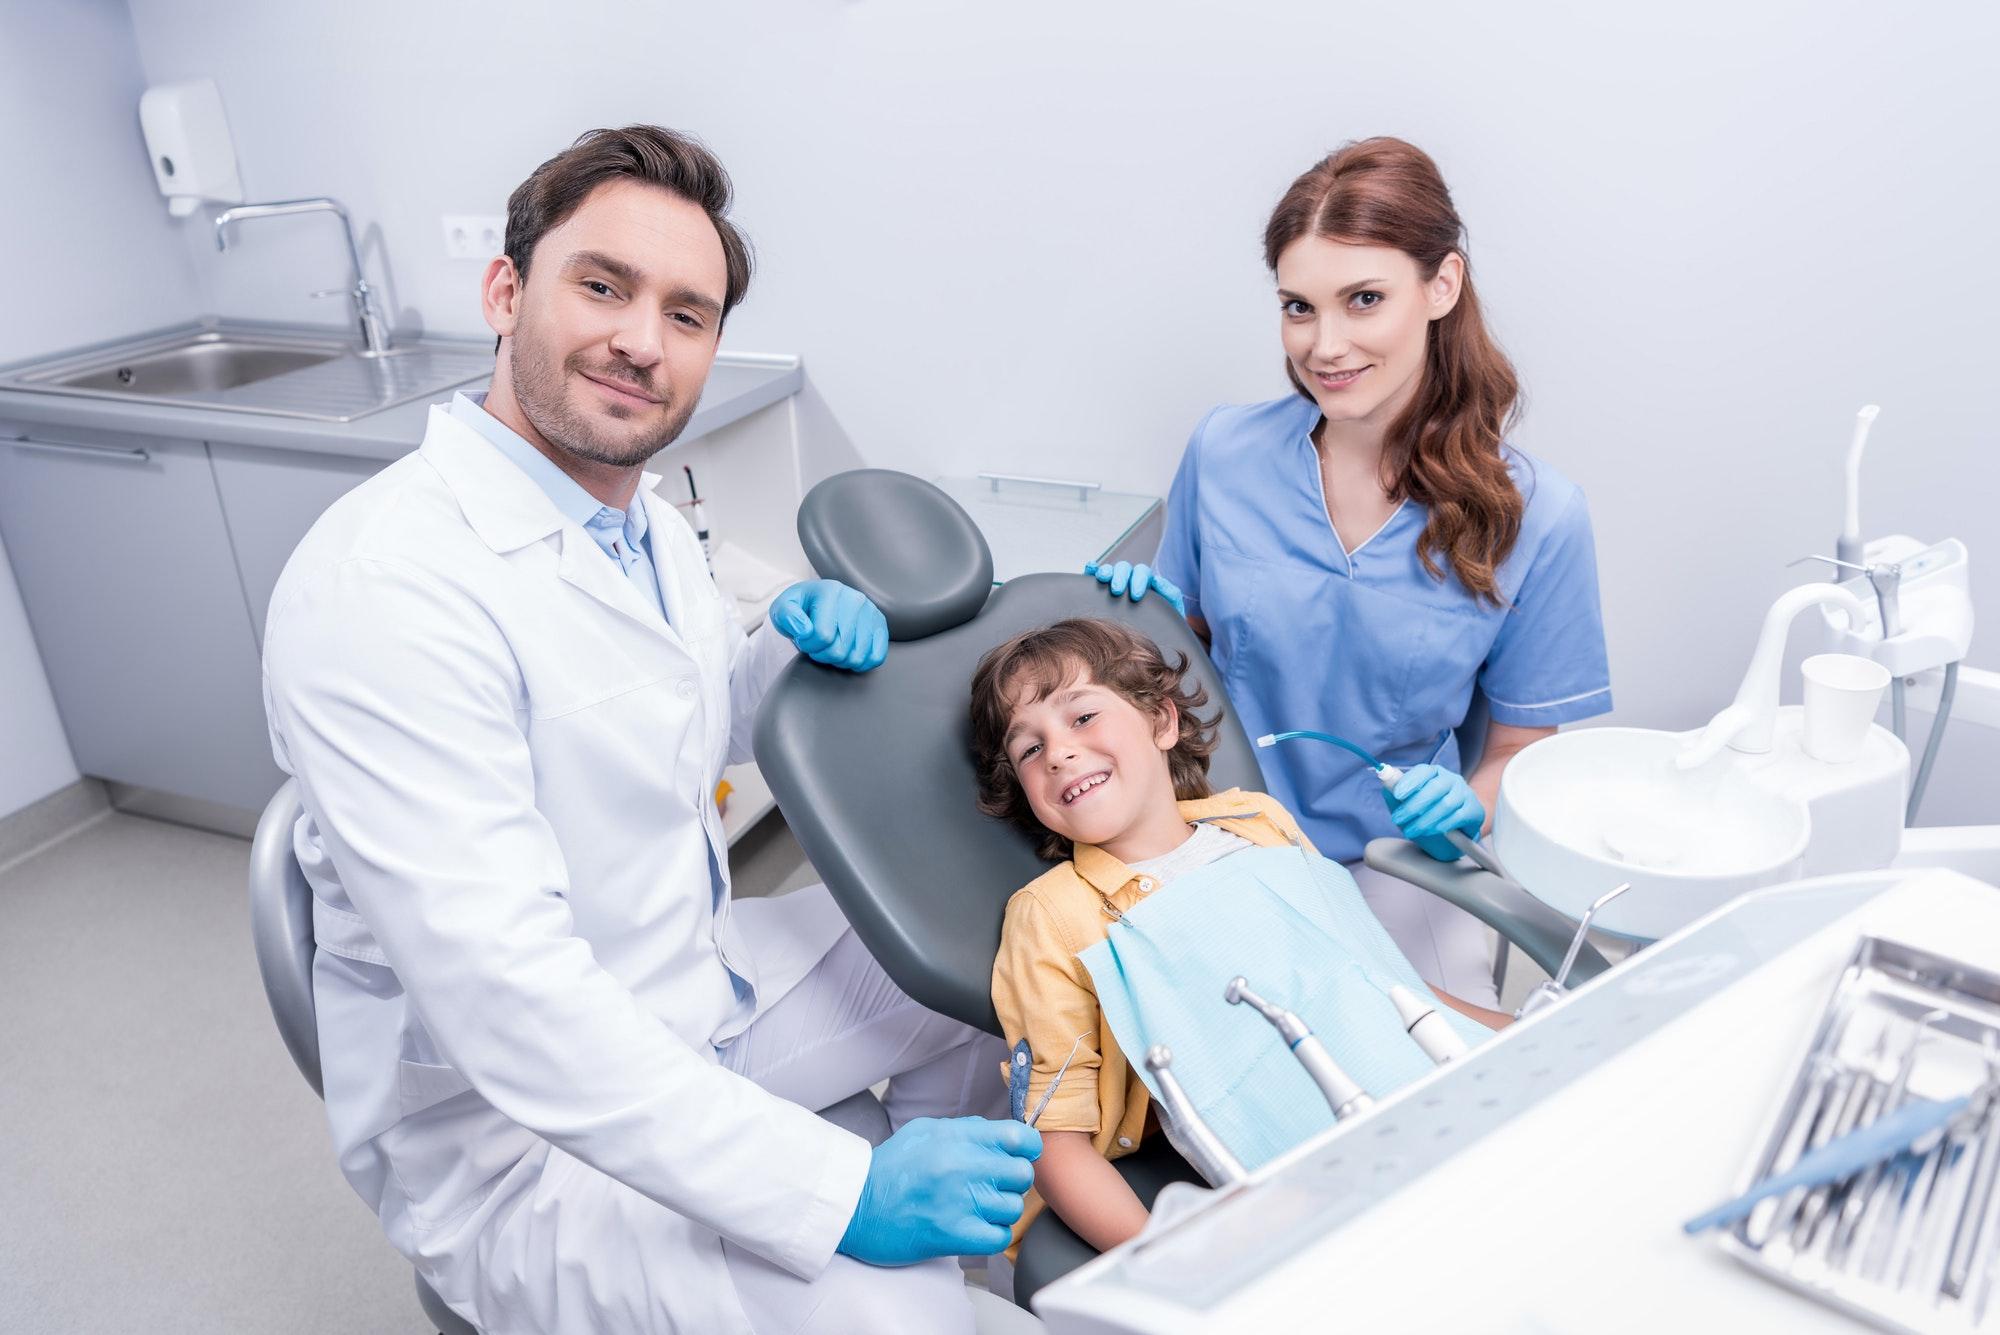 dentists preparing little boy for examining teeth at dentist office